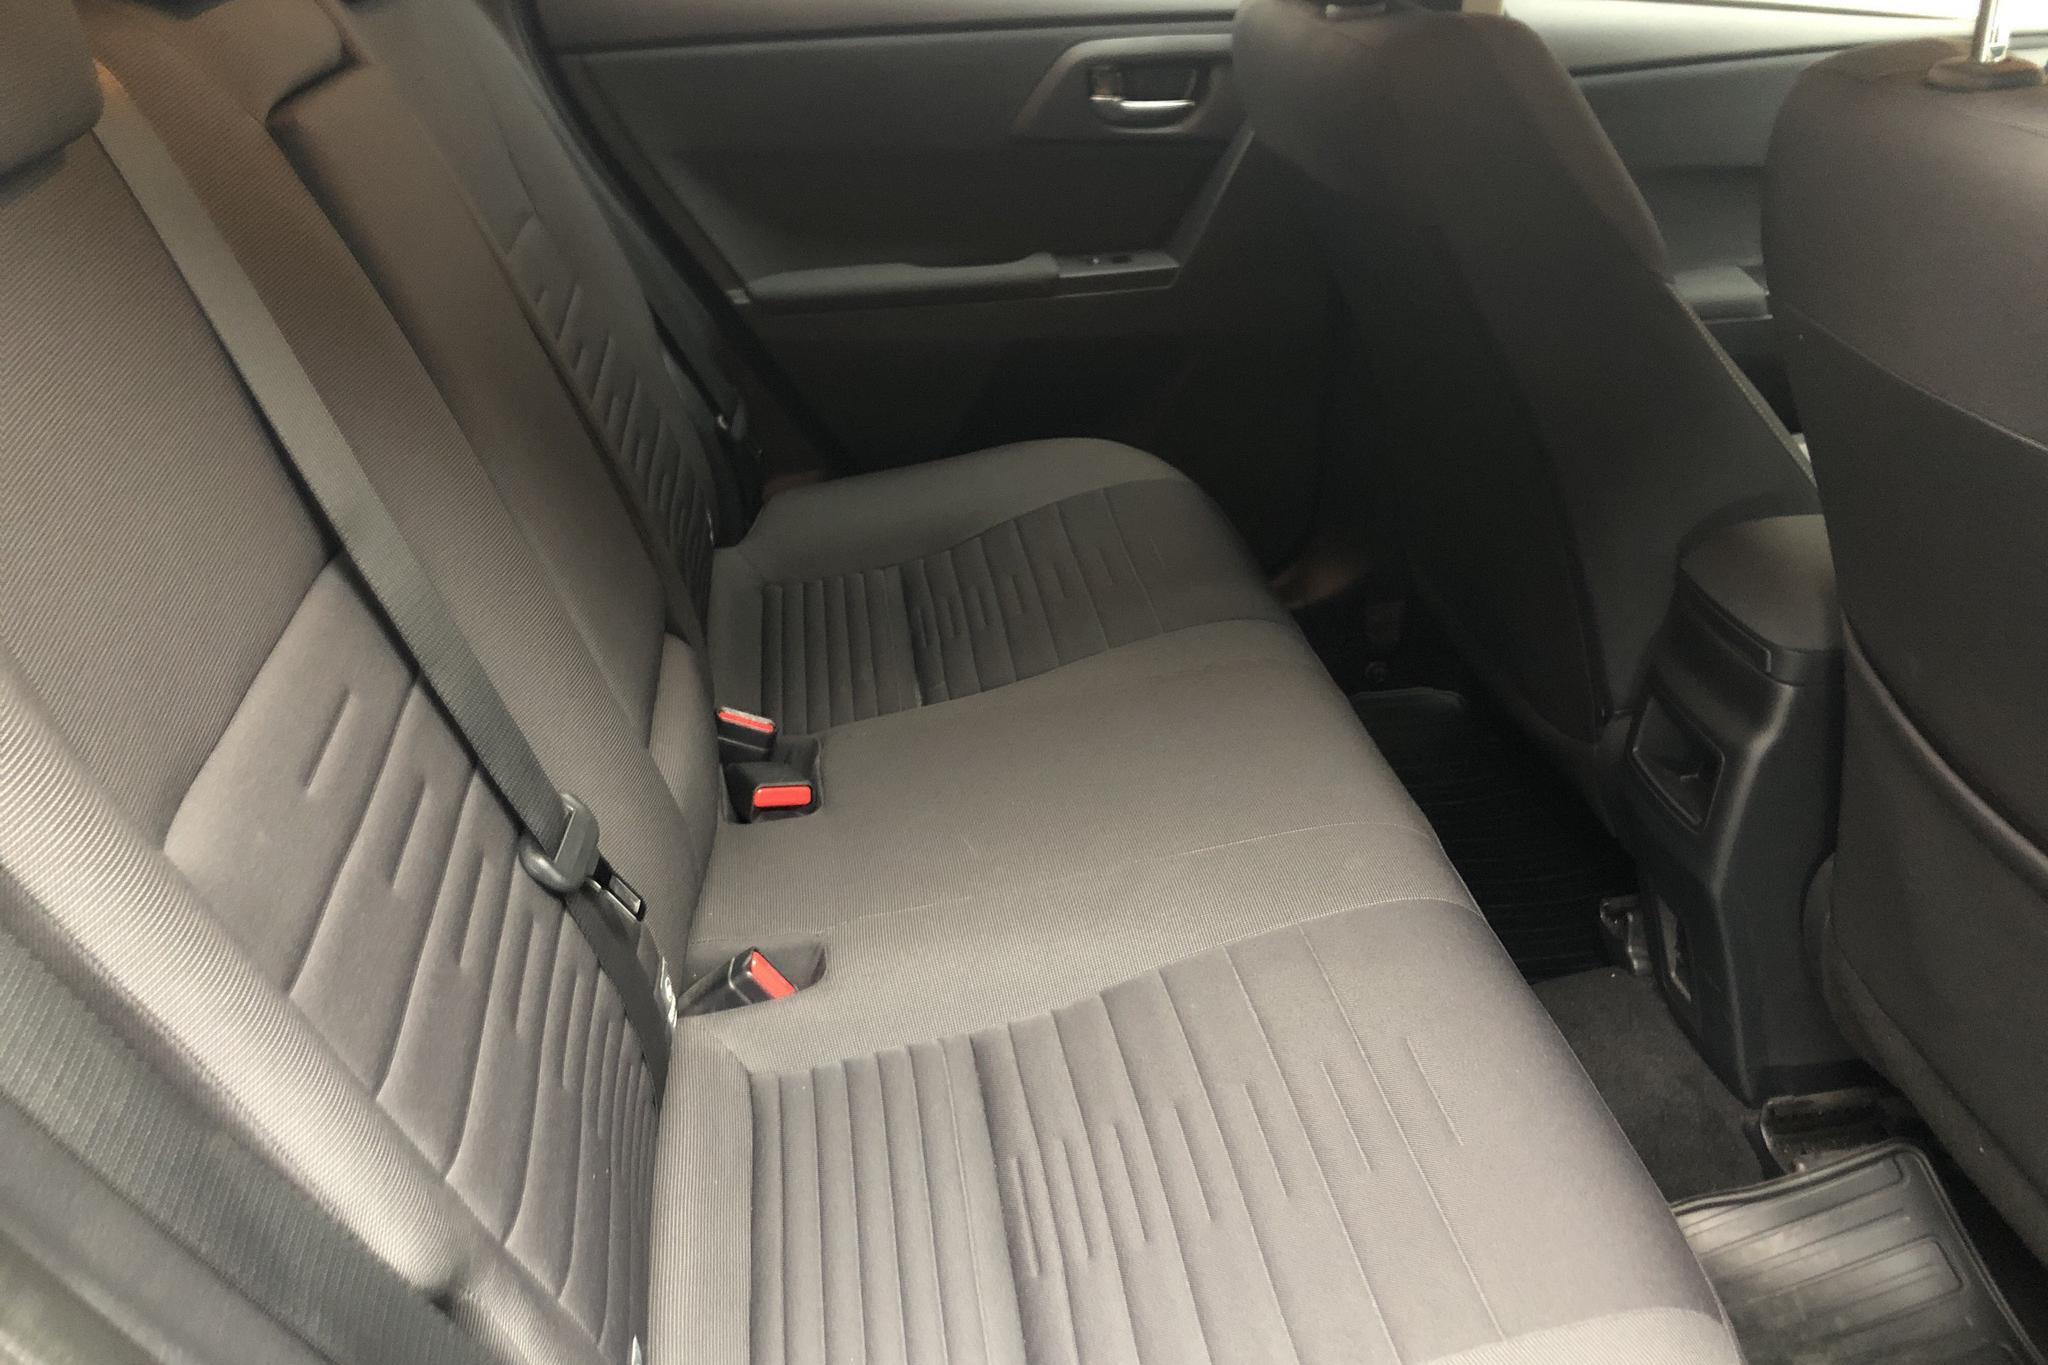 Toyota Auris 1.8 HSD 5dr (99hk) - 3 639 mil - Automat - Dark Grey - 2016